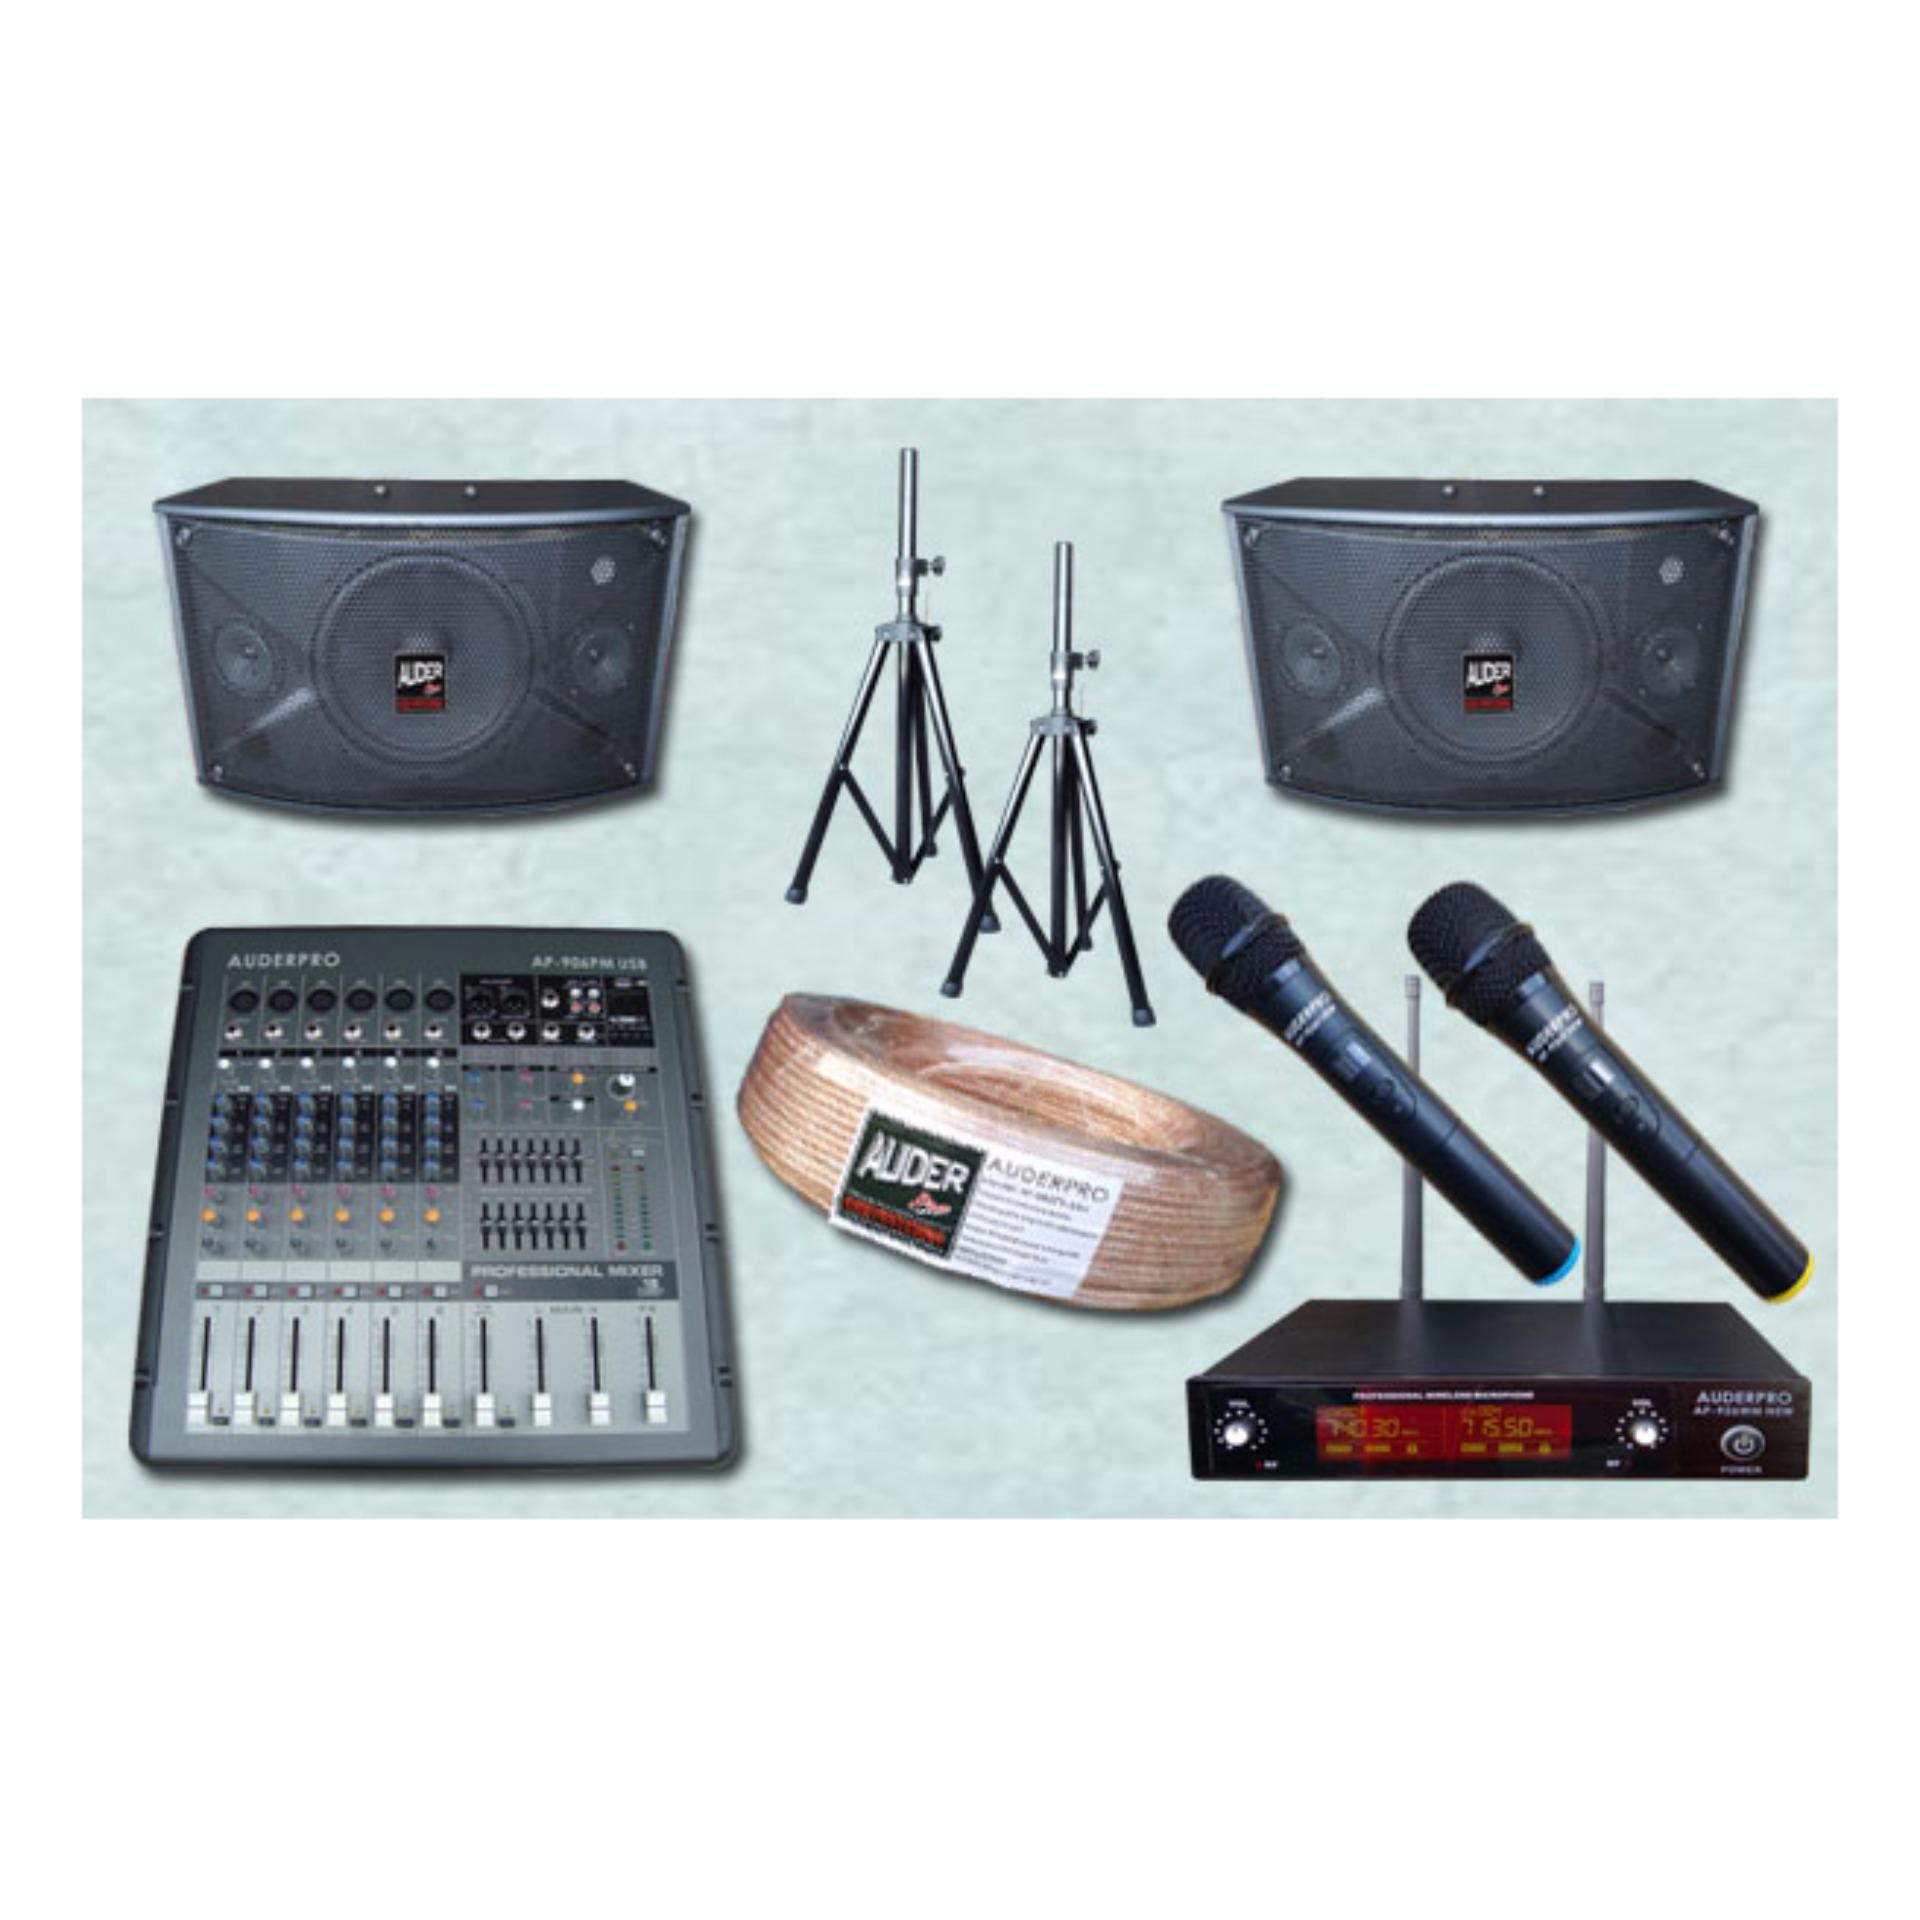 Jual Sound System Paket Rapat Kecil 4 Auderpro Auderpro Grosir